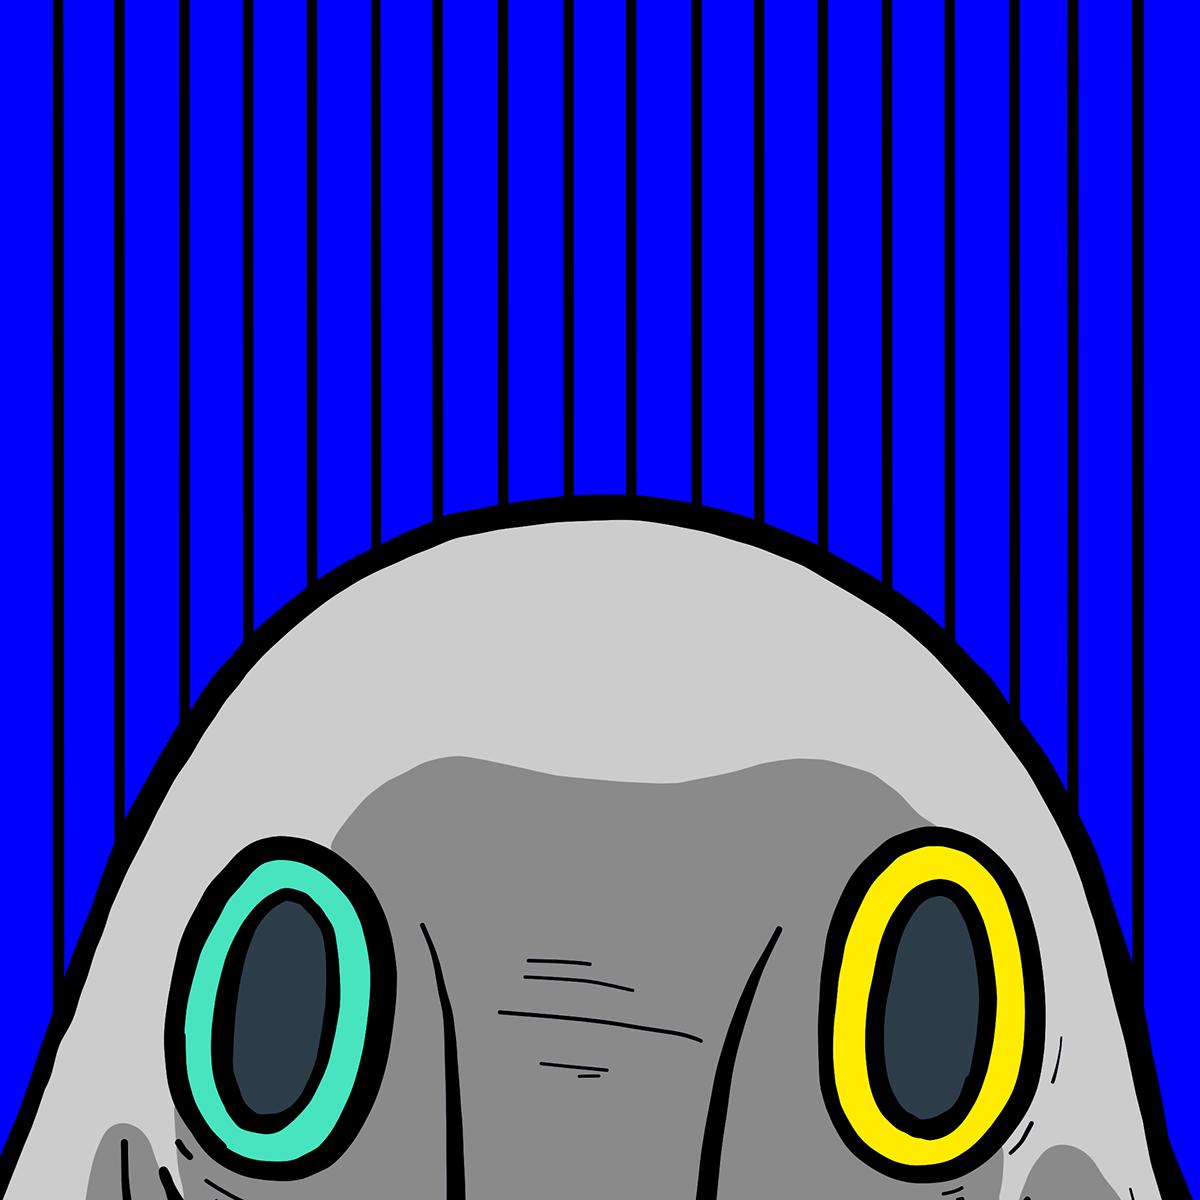 Image may contain: cartoon, art and illustration